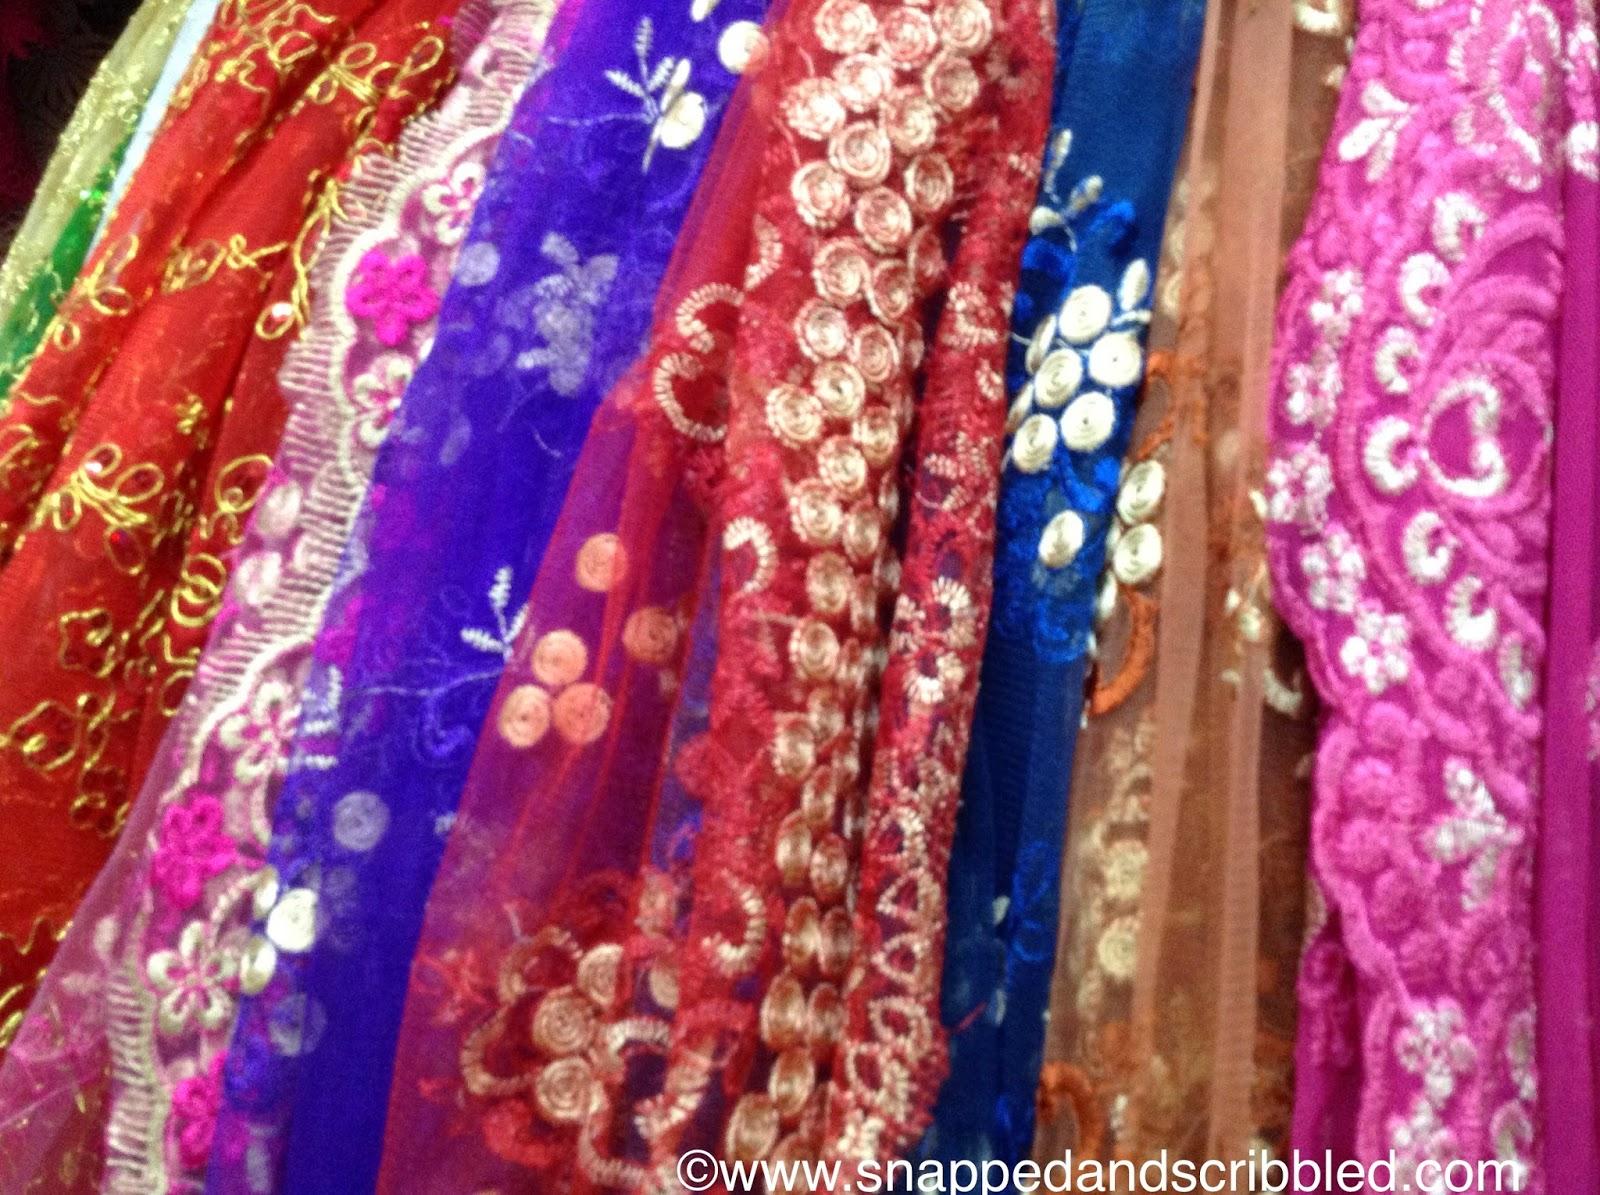 Where To Buy Bridal and Wedding Fabrics: JJMJJ House of Fabrics